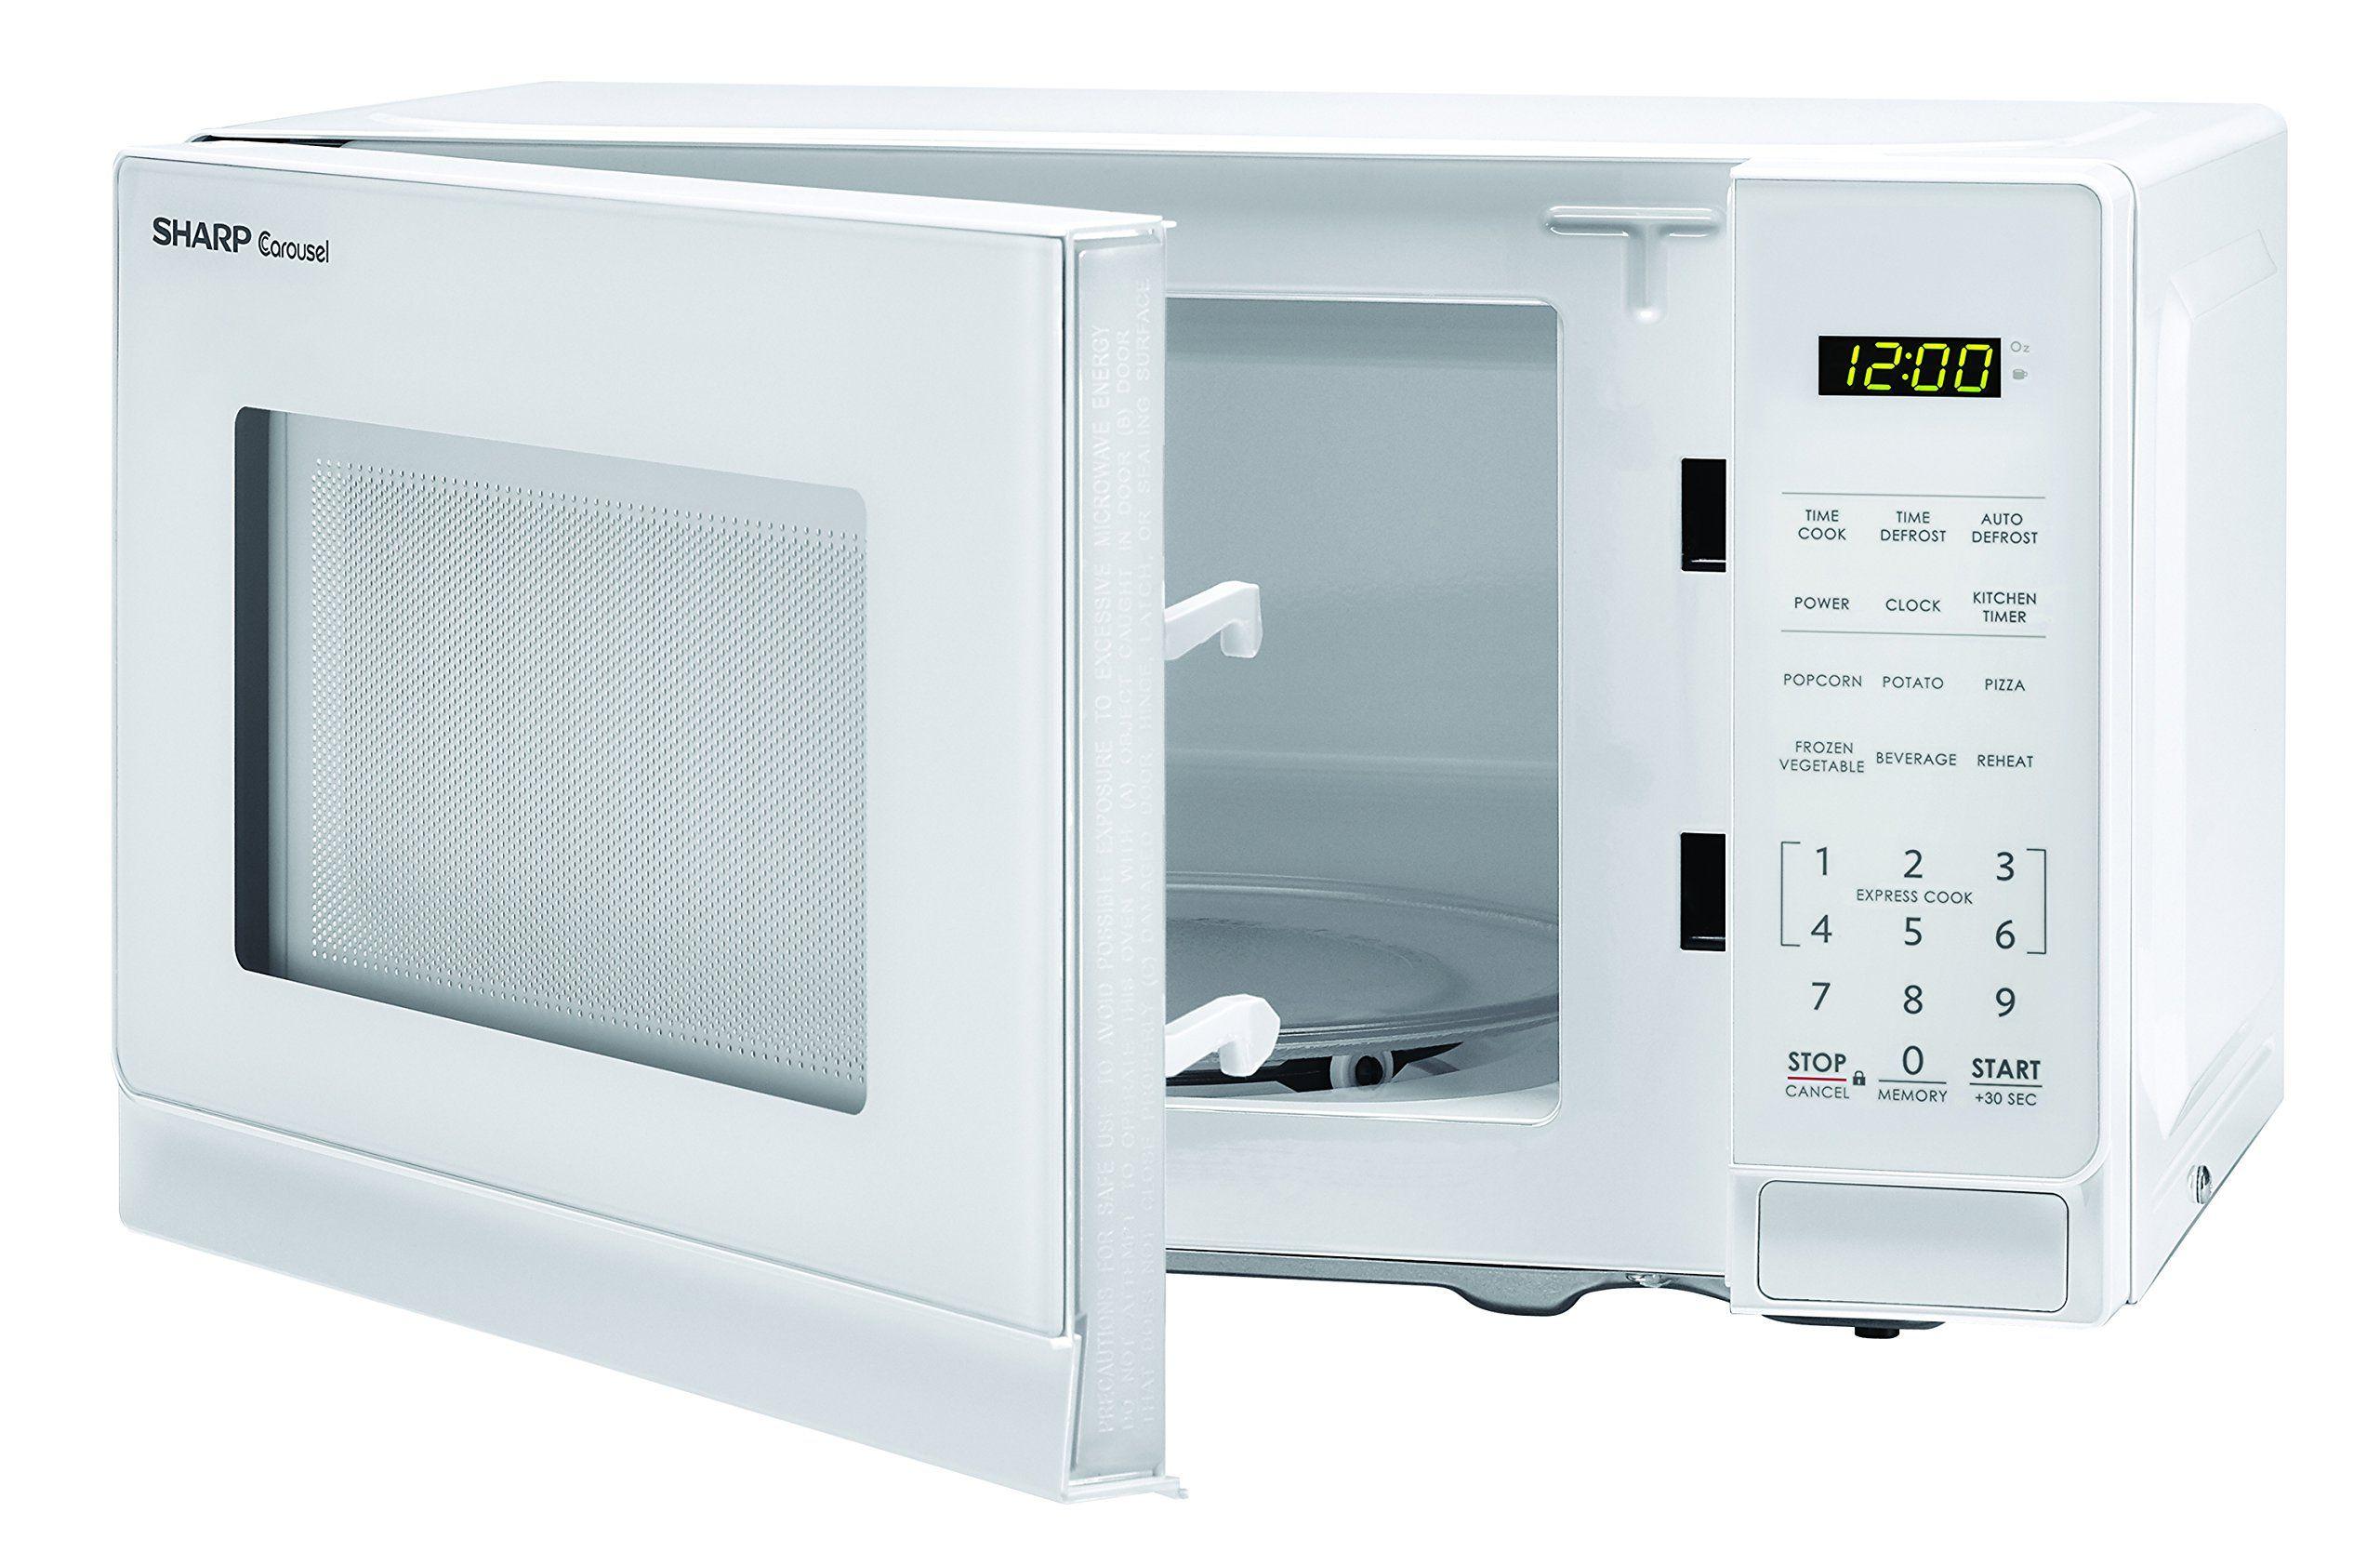 Sharp Microwaves Zsmc0710bw Sharp 700w Countertop Microwave Oven